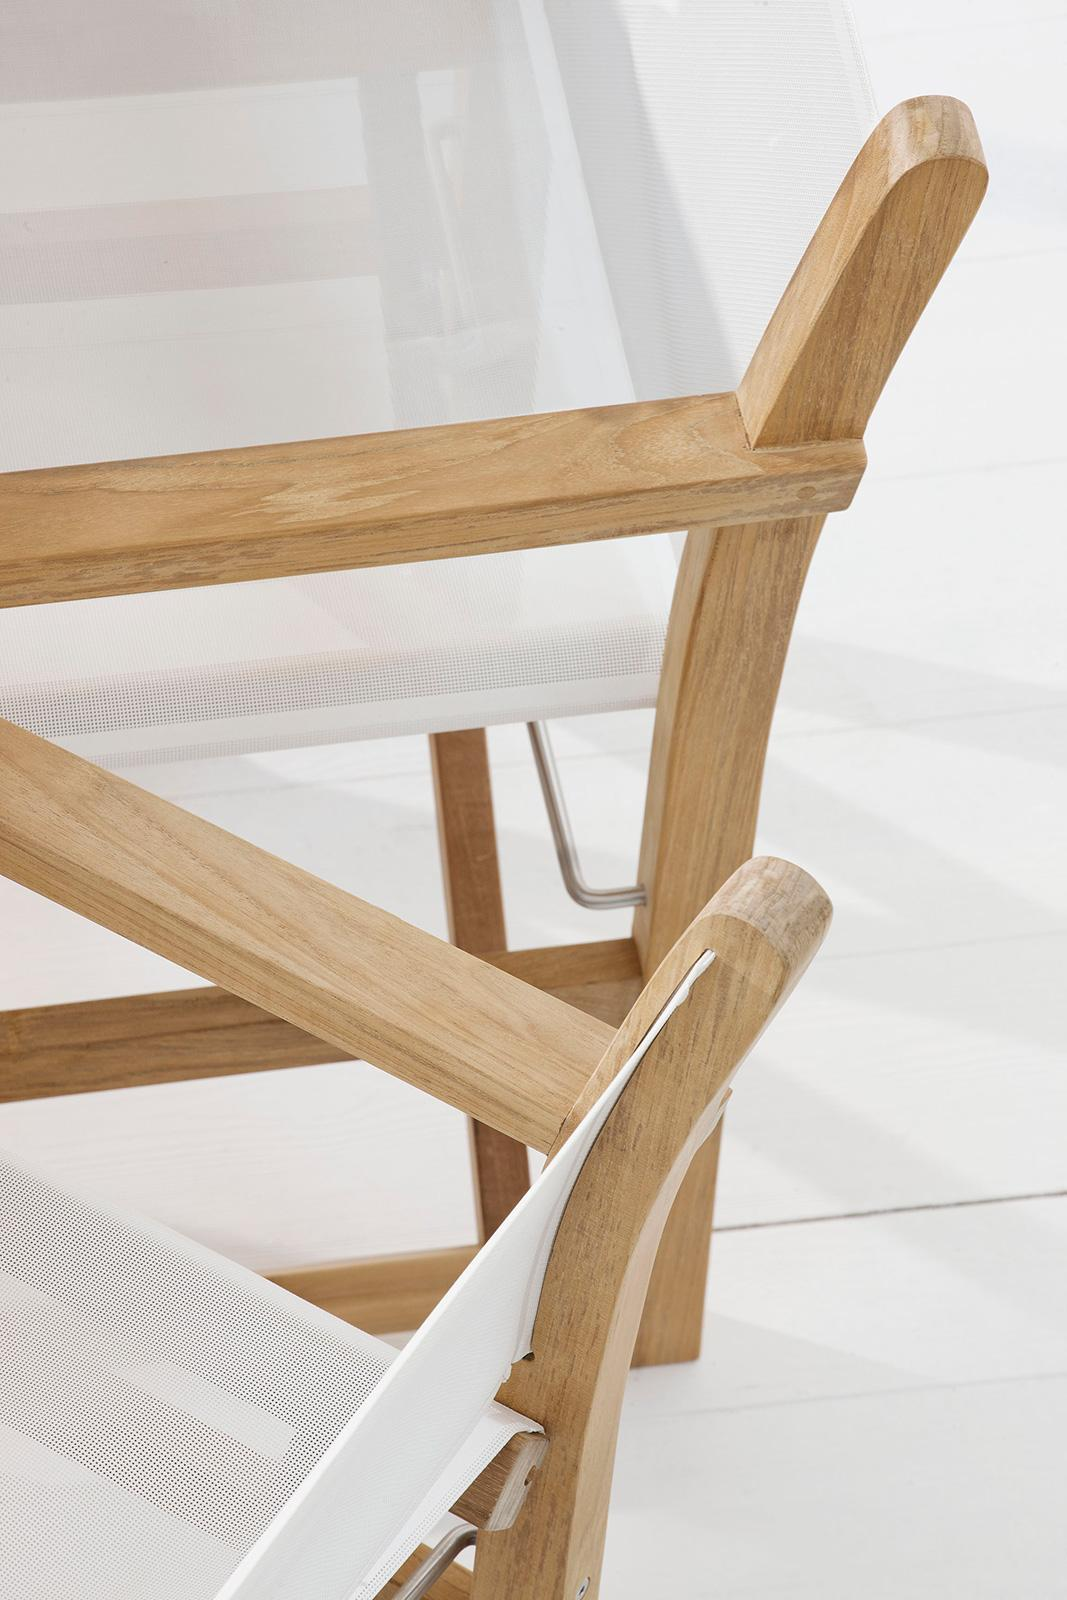 Outdoor director chair in teak and textilene. Outdoor folding luxury chair. Whole outdoor luxury & Sahara outdoor director chair in teak - IDD